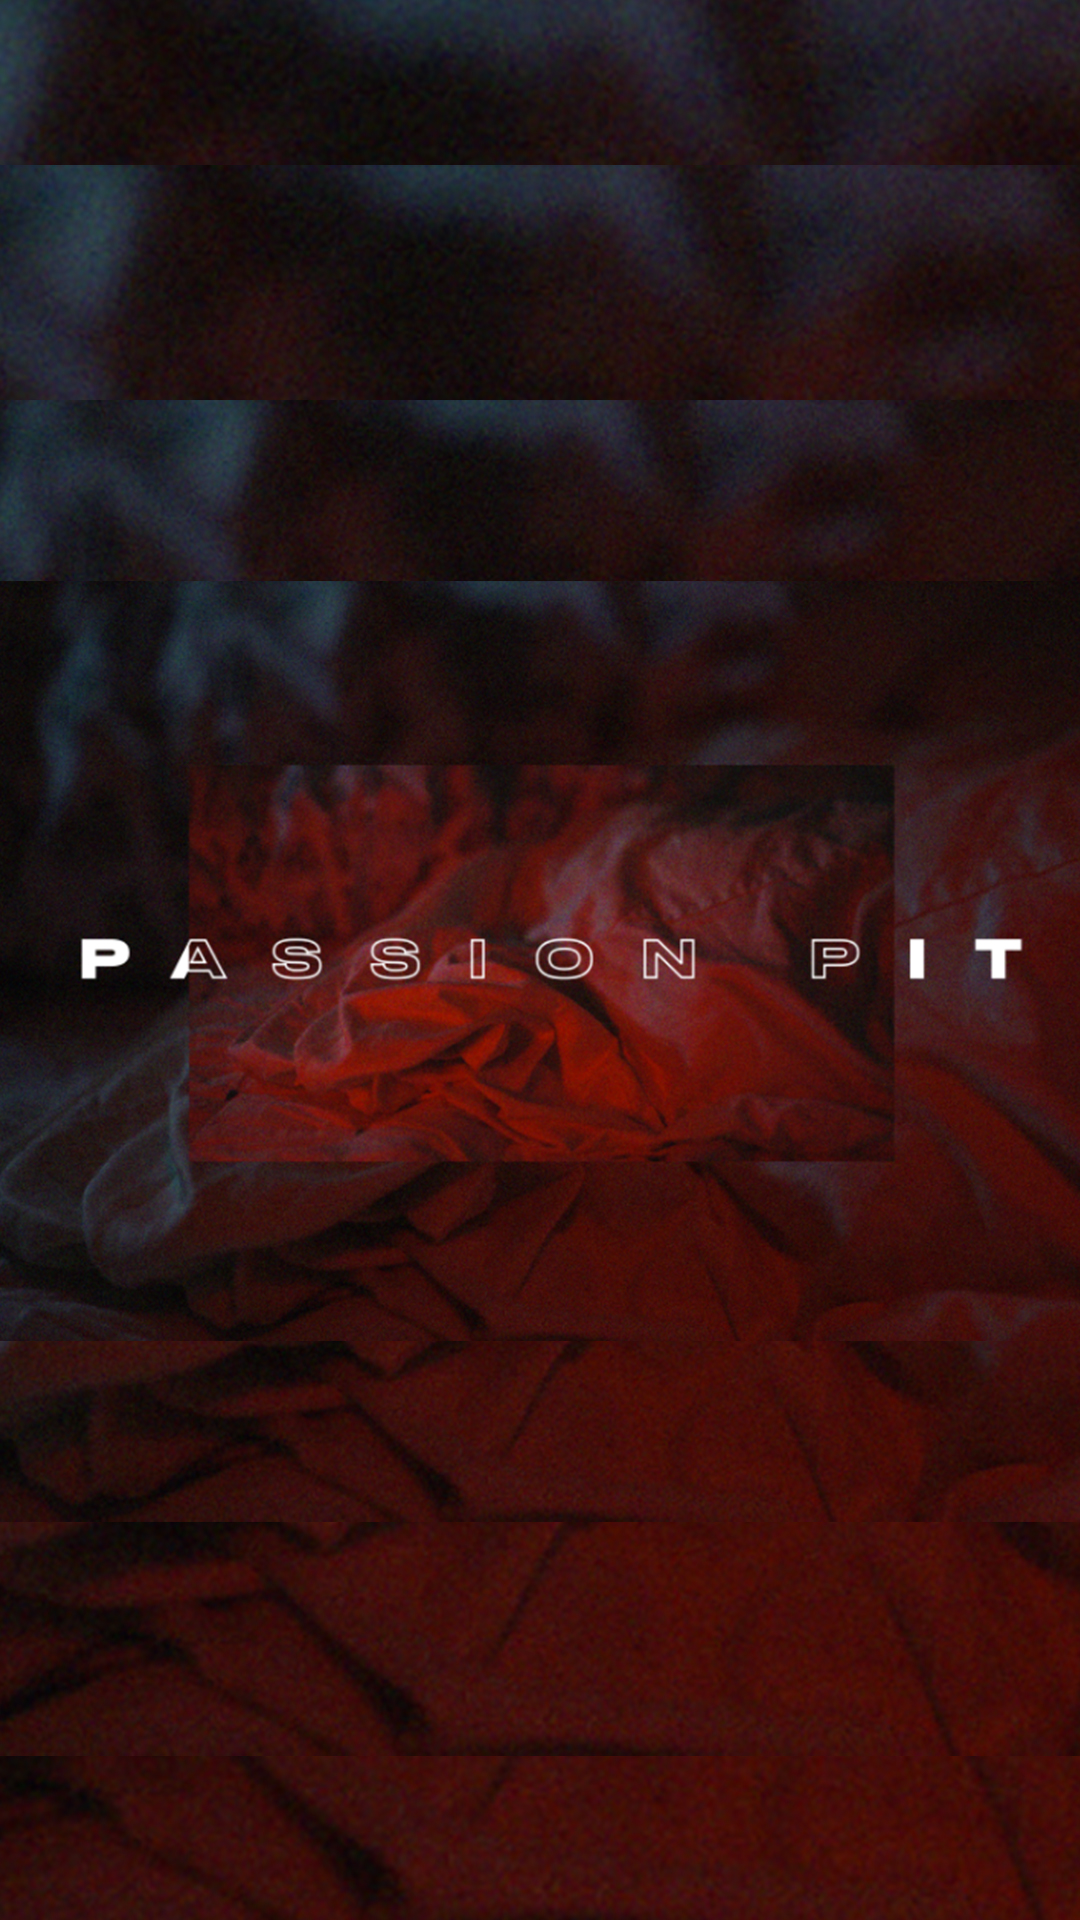 PassionPit_VideoContent_Revamp_Posters3.jpg